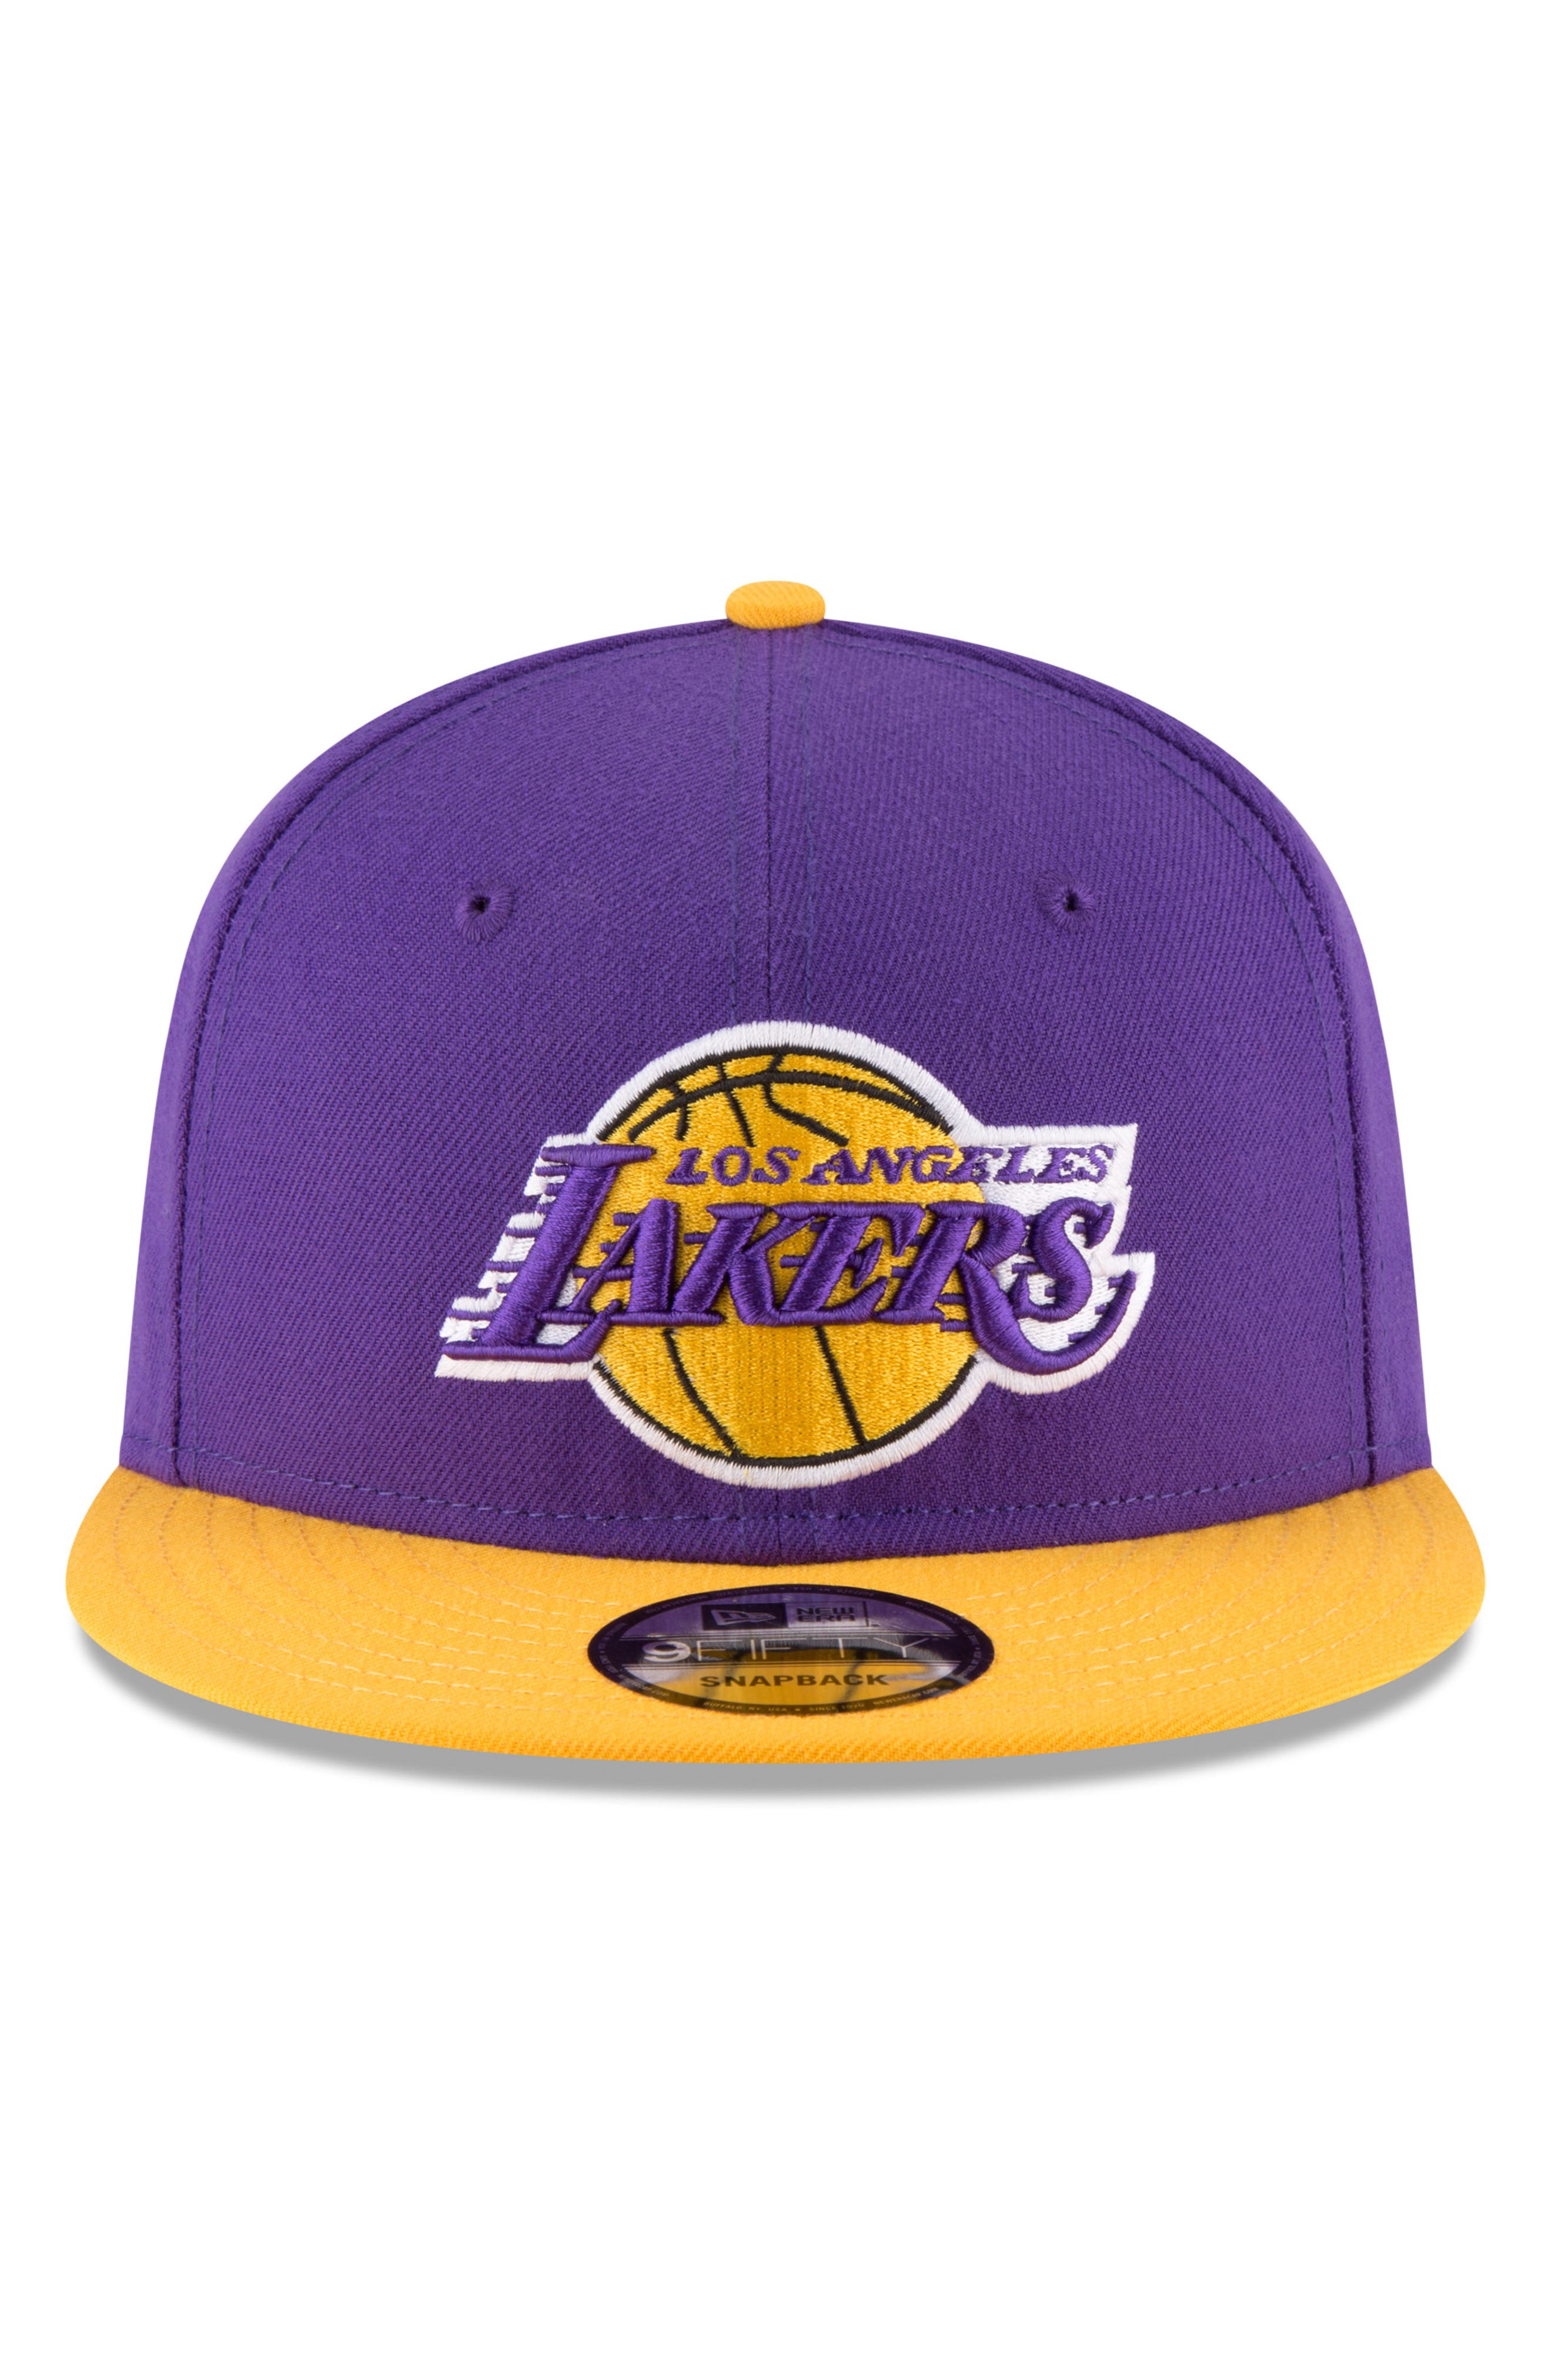 9FIFTY LA Lakers Two-Tone Cap,                             Alternate thumbnail 4, color,                             PURPLE